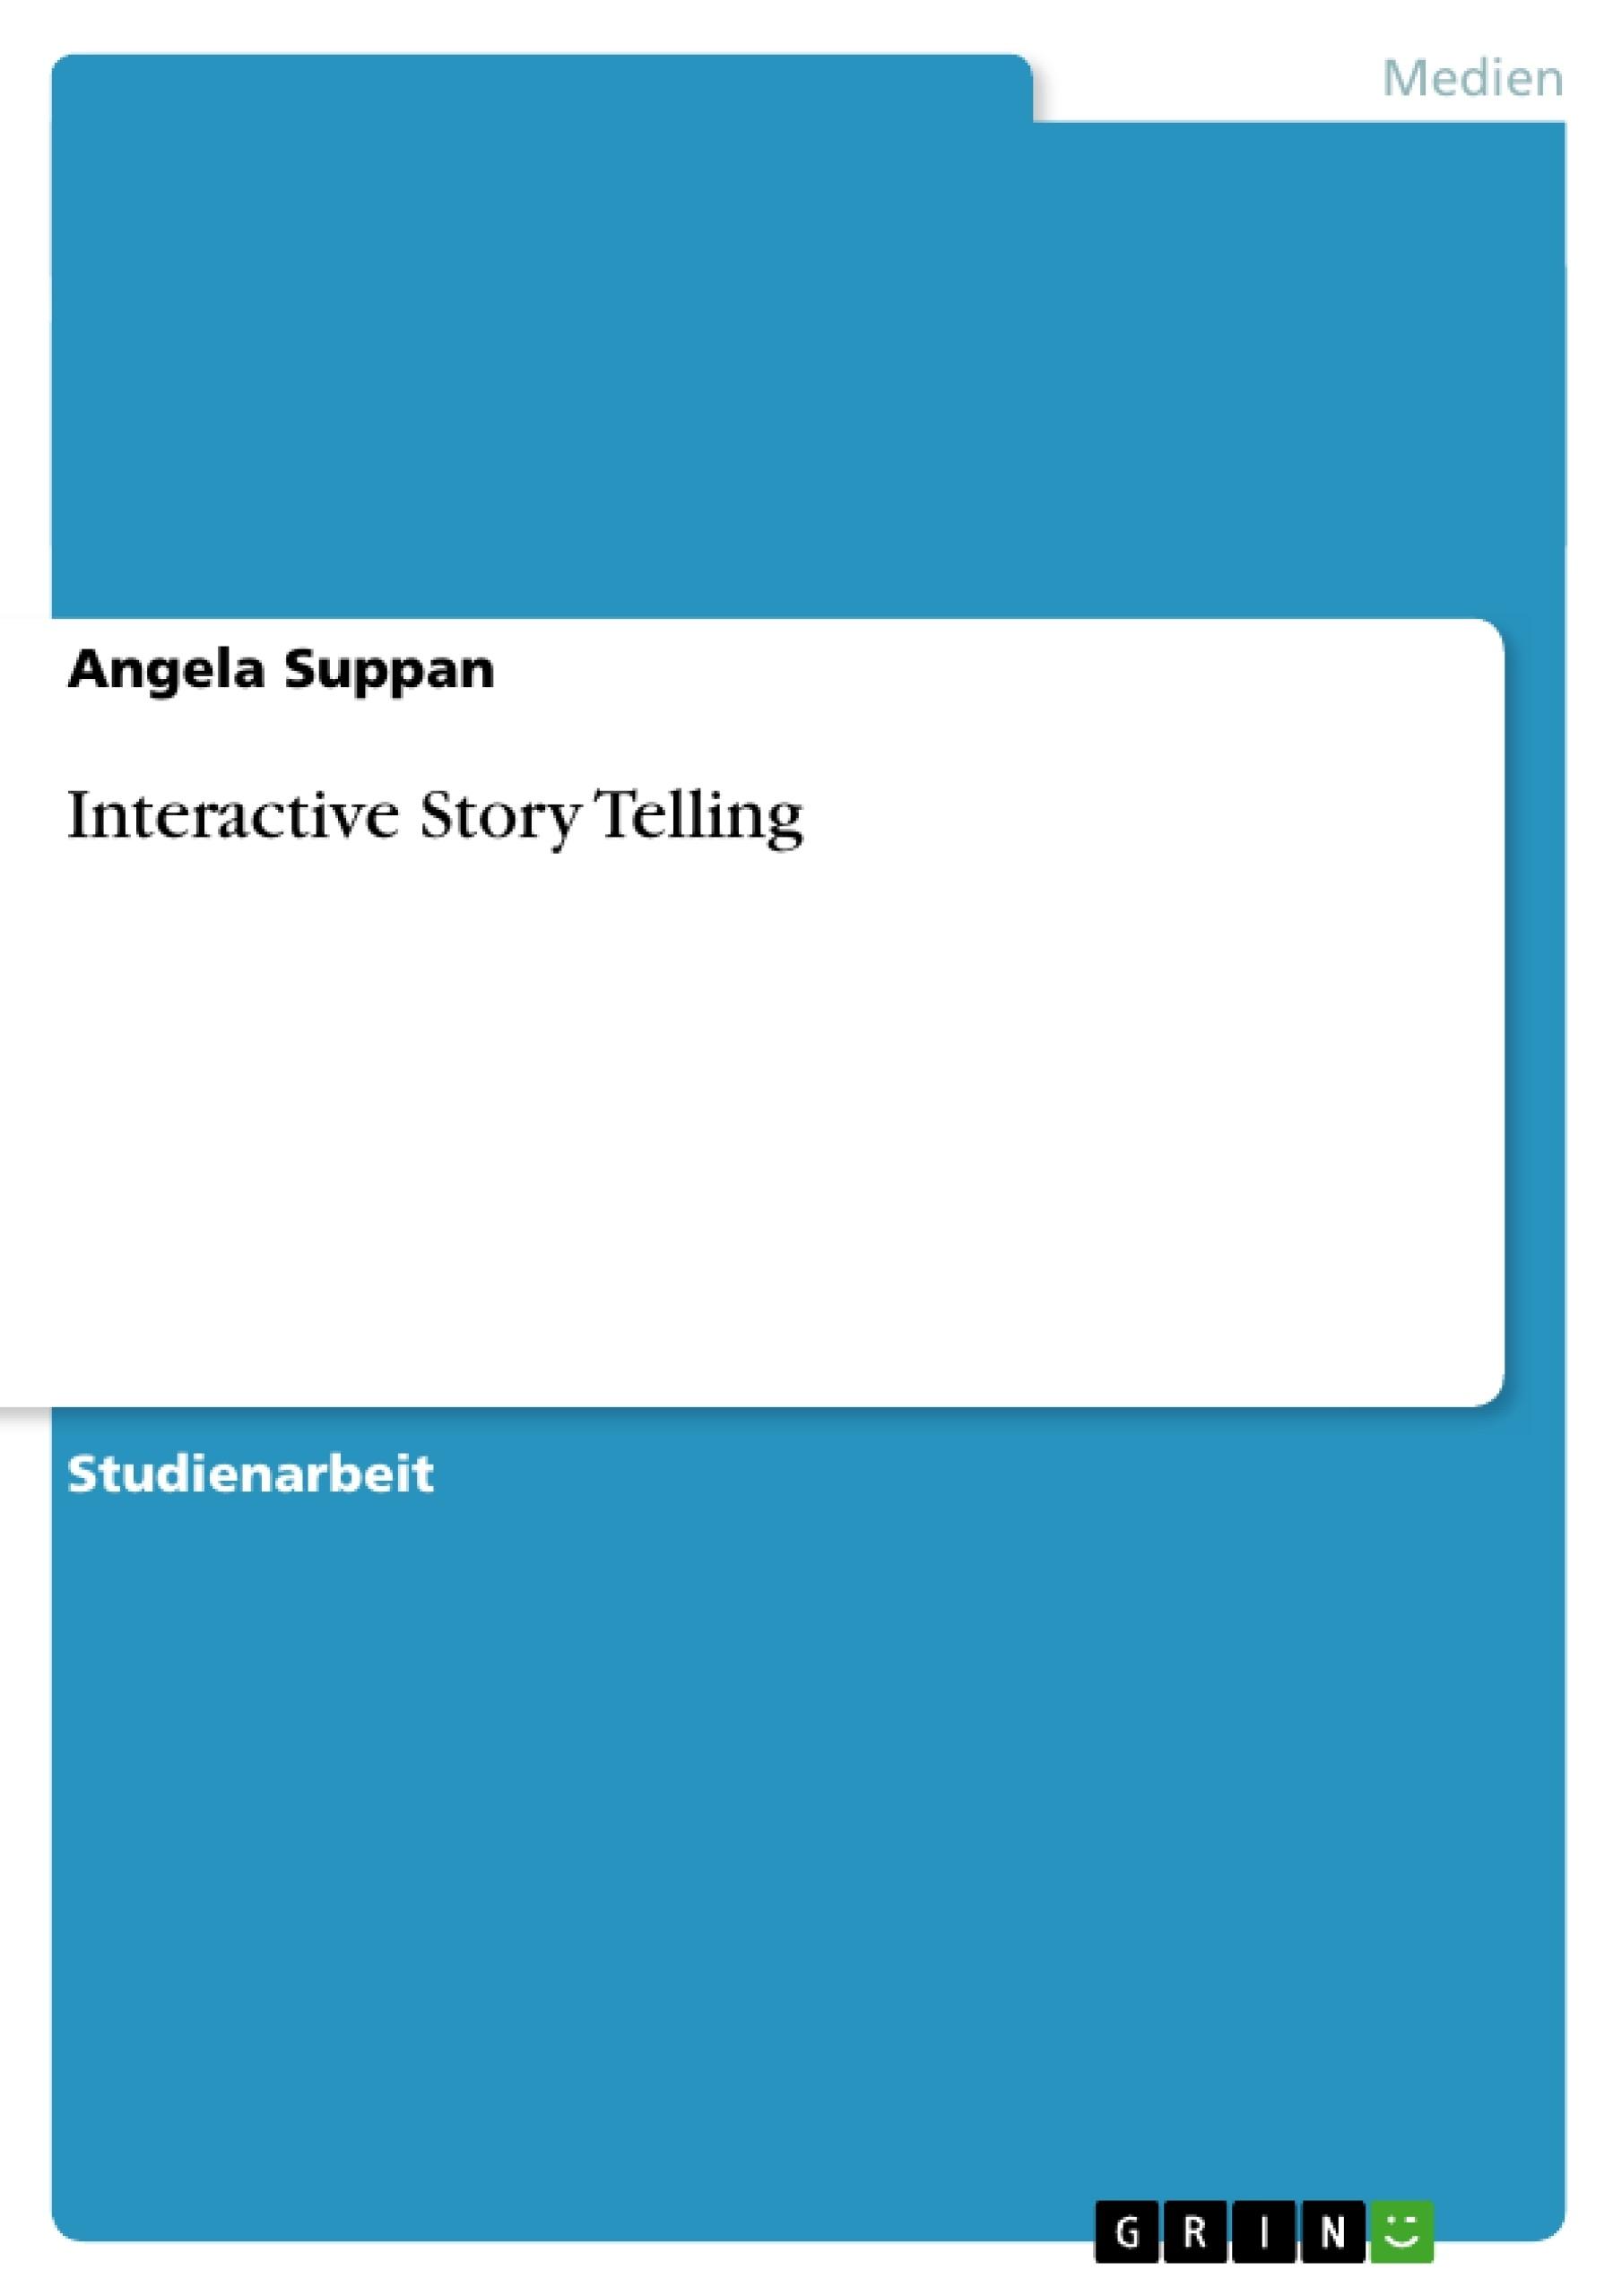 Titel: Interactive Story Telling